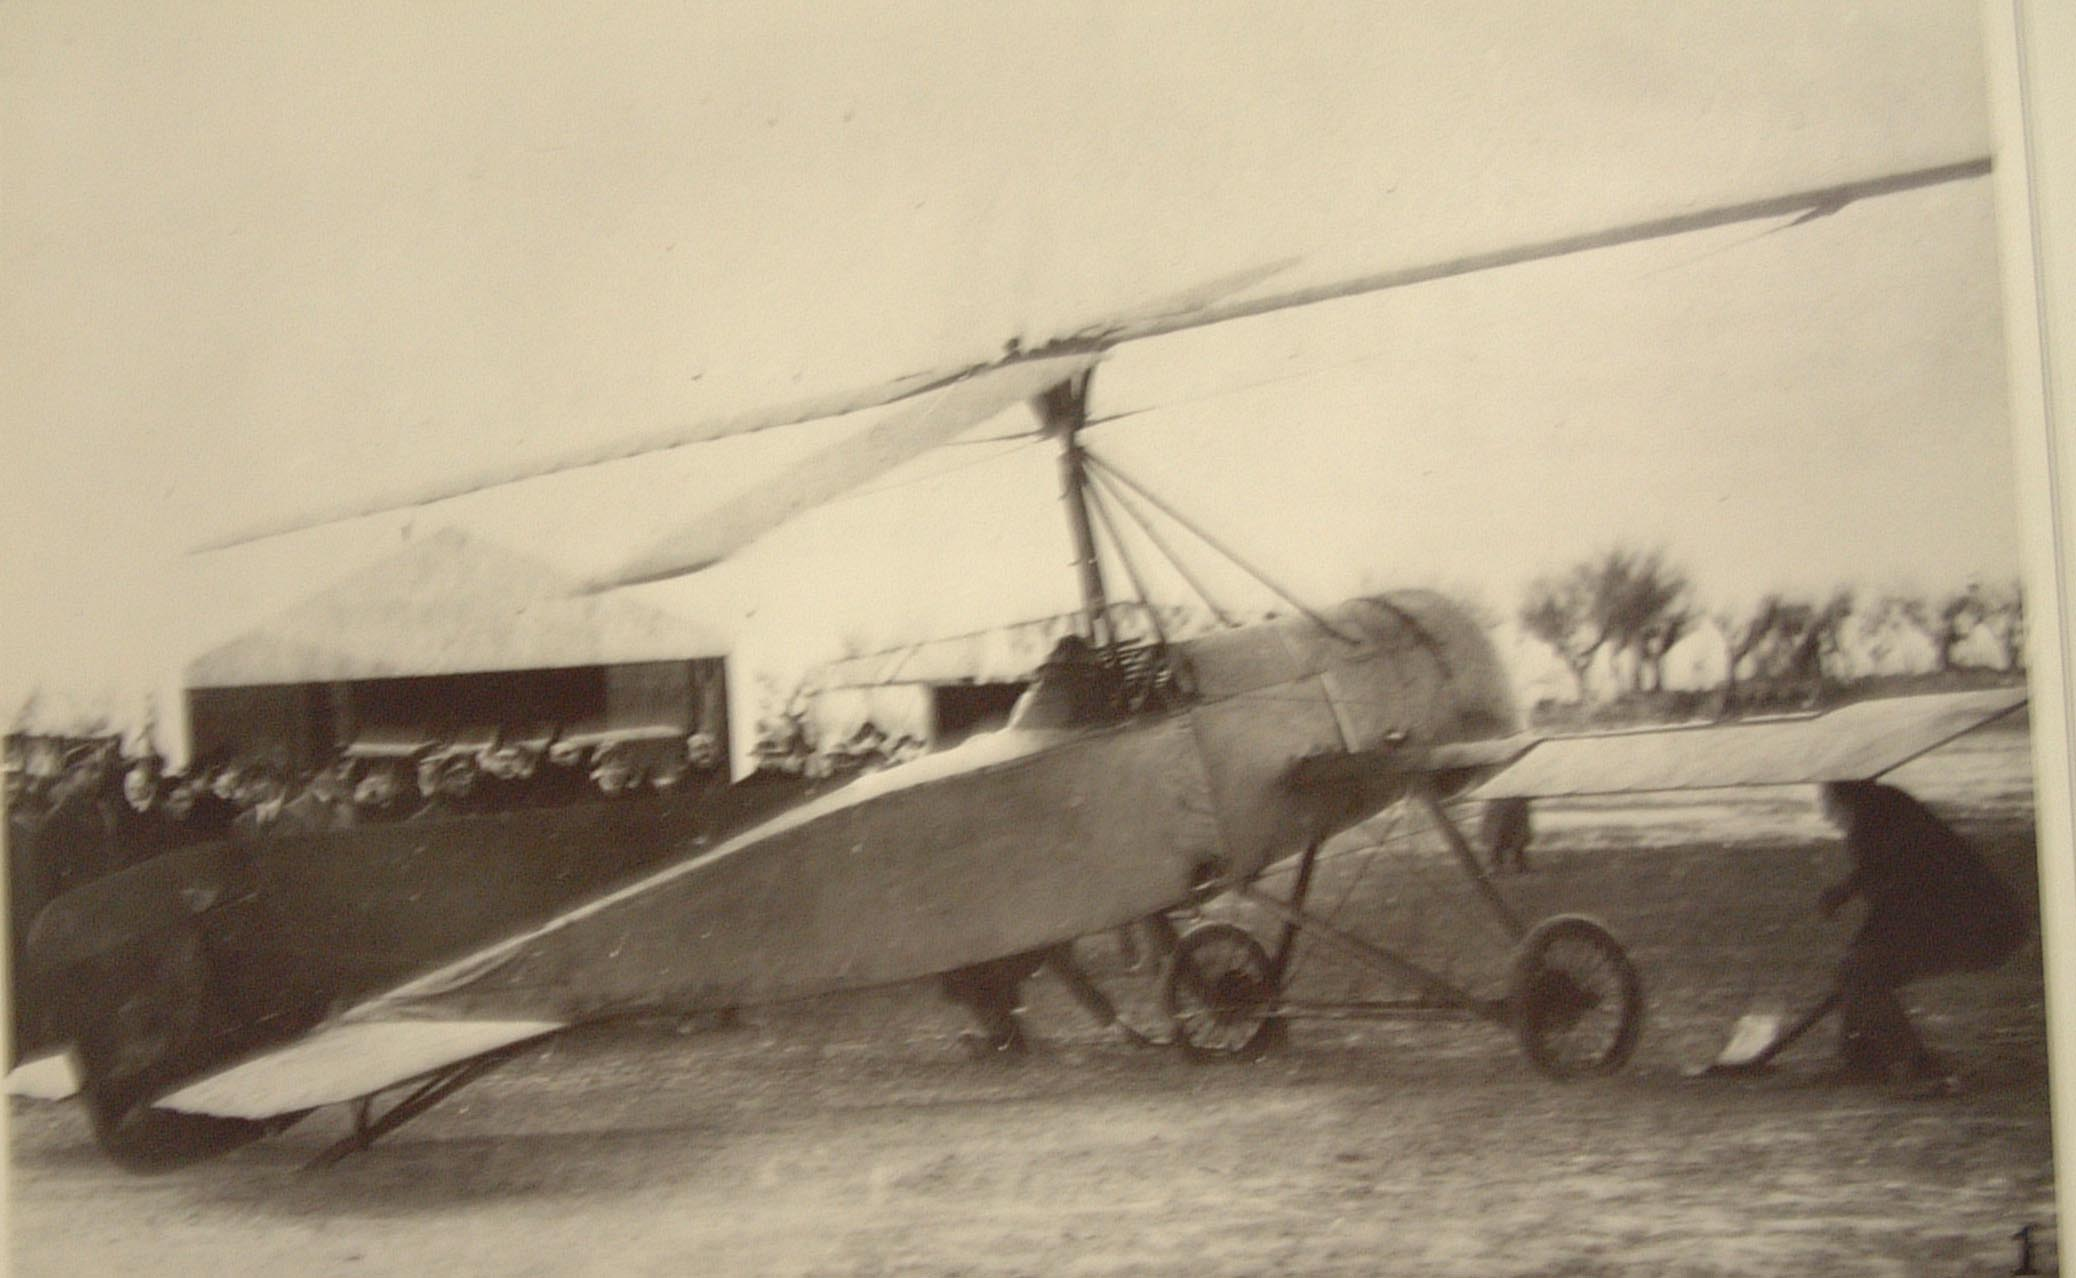 Autogyron's Cierva C.4